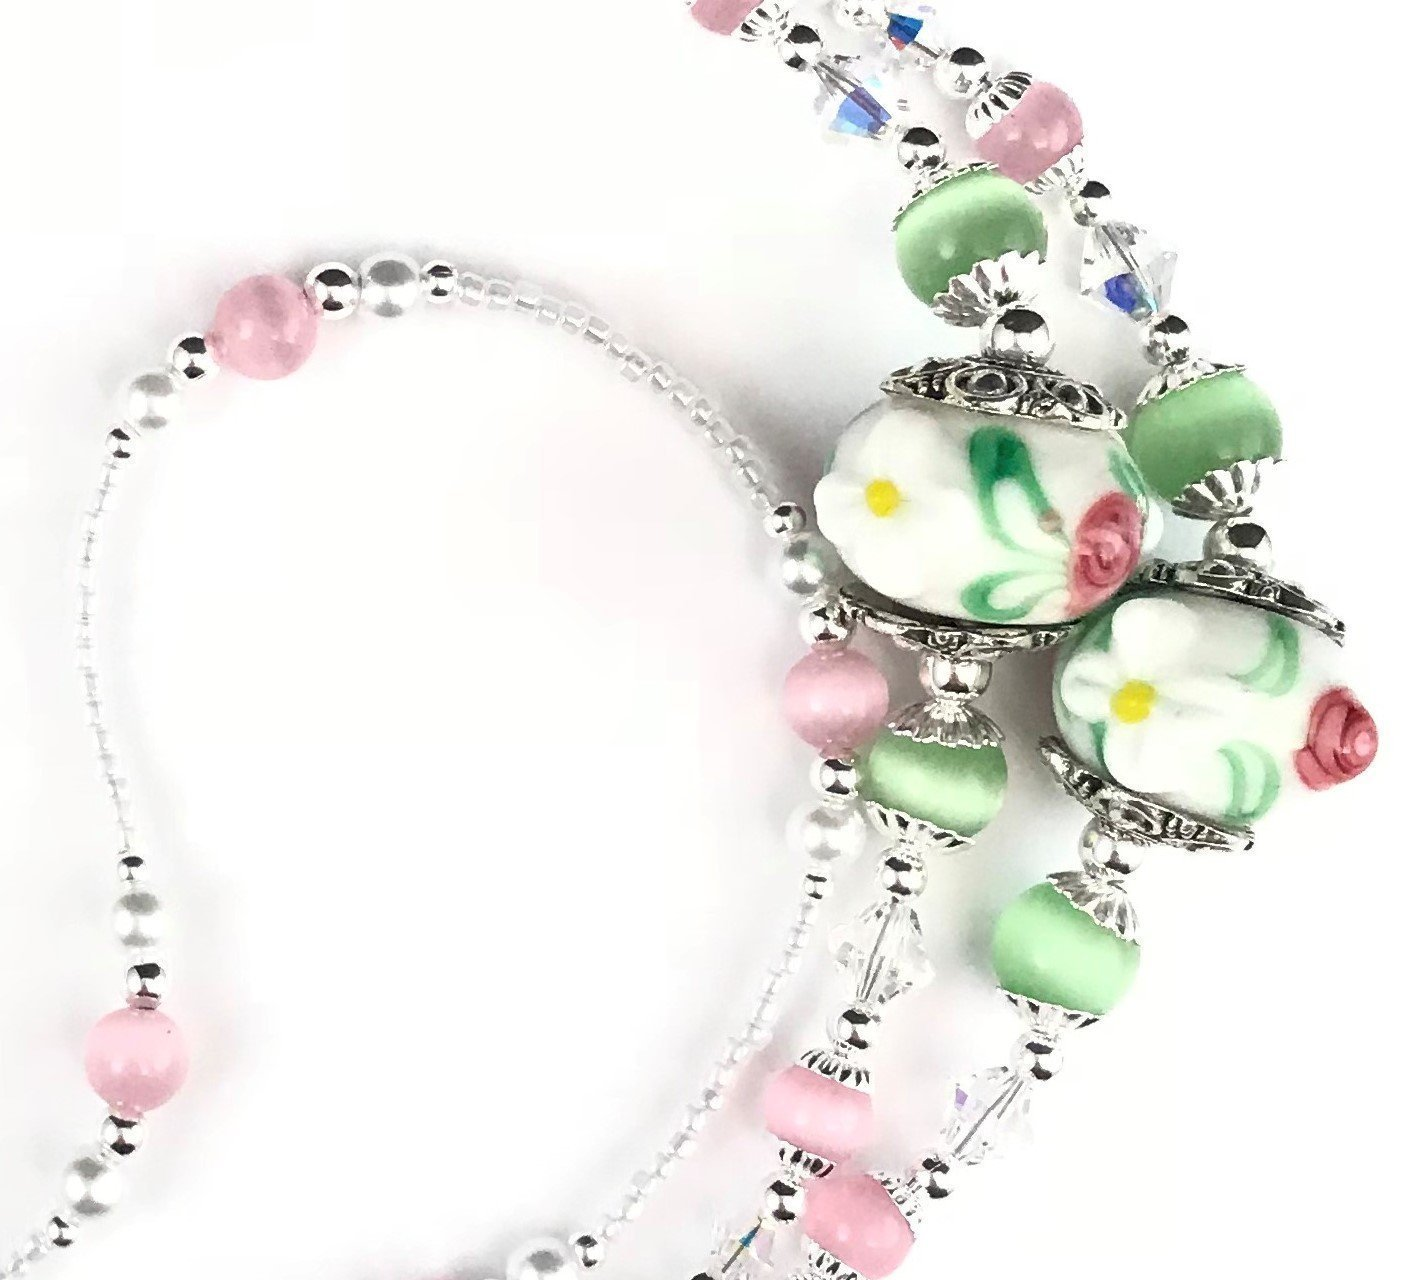 ba307d7b98e21 Beaded Lanyard Badge ID Holder~Roses & Daisies~Swarovski Crystal ...